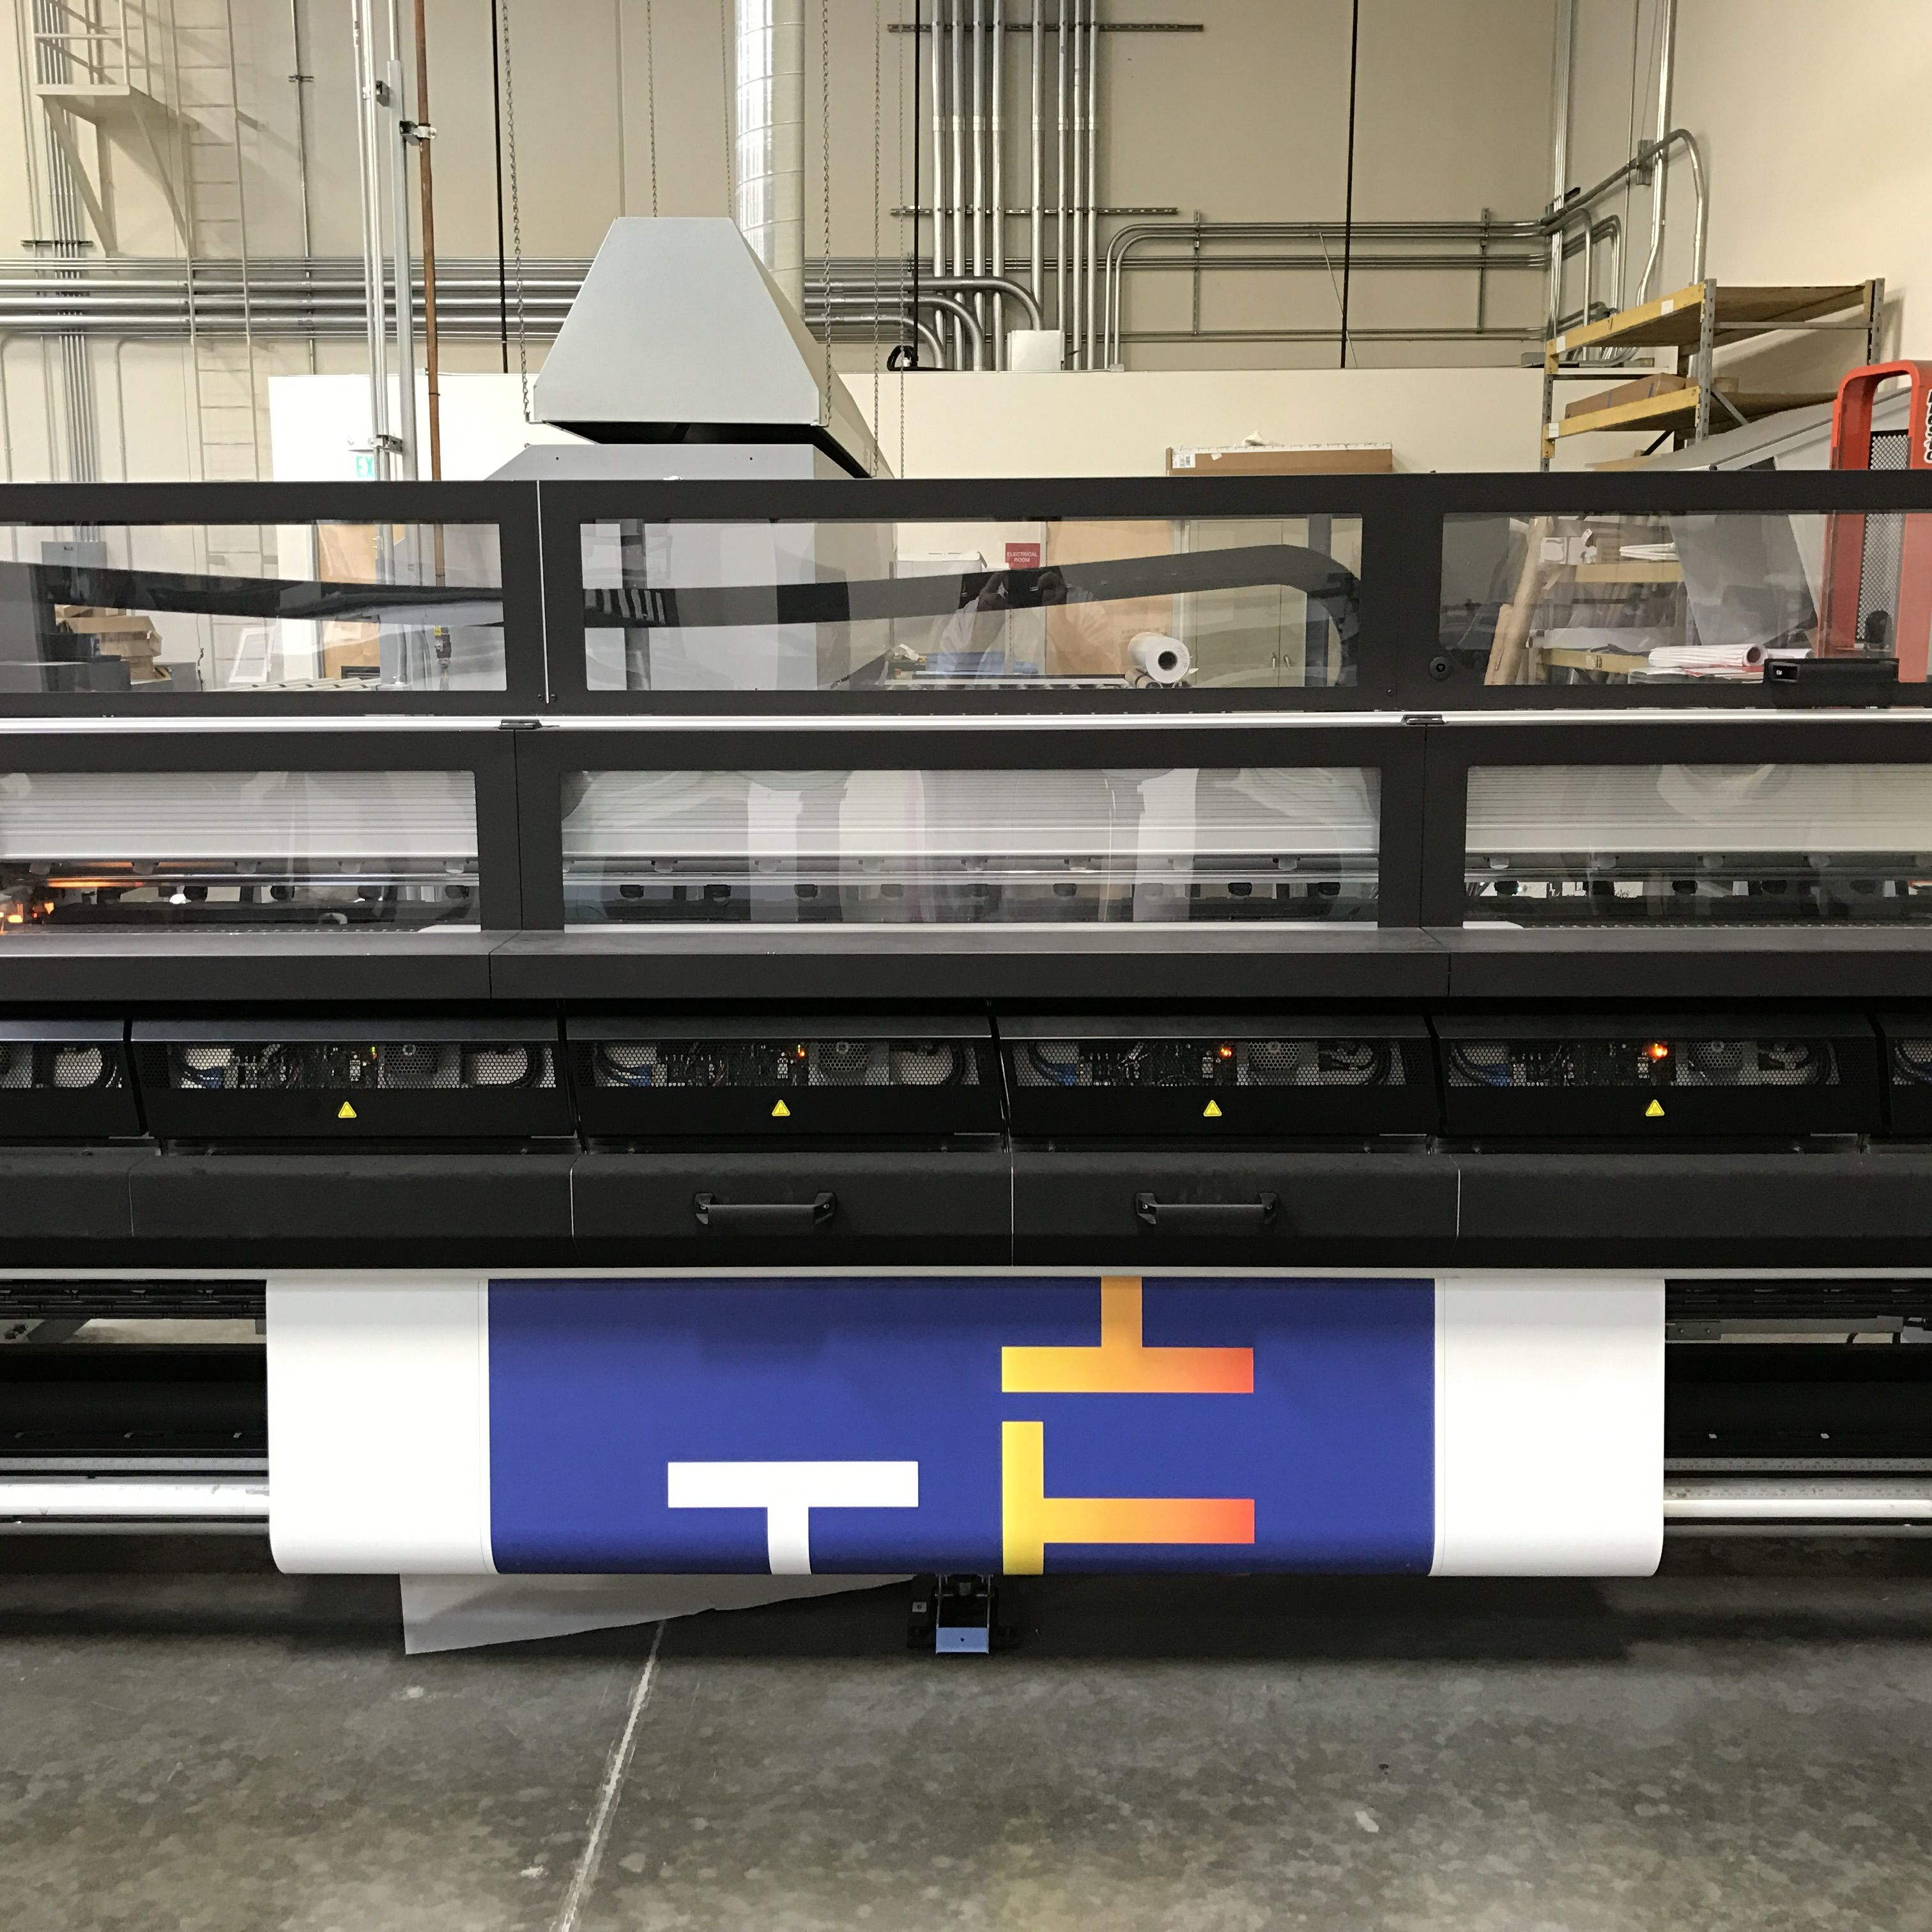 #HP #Latex Printer #WideFormatPrinting #LargeFormatPrinting #DigitalPrinting #Banners